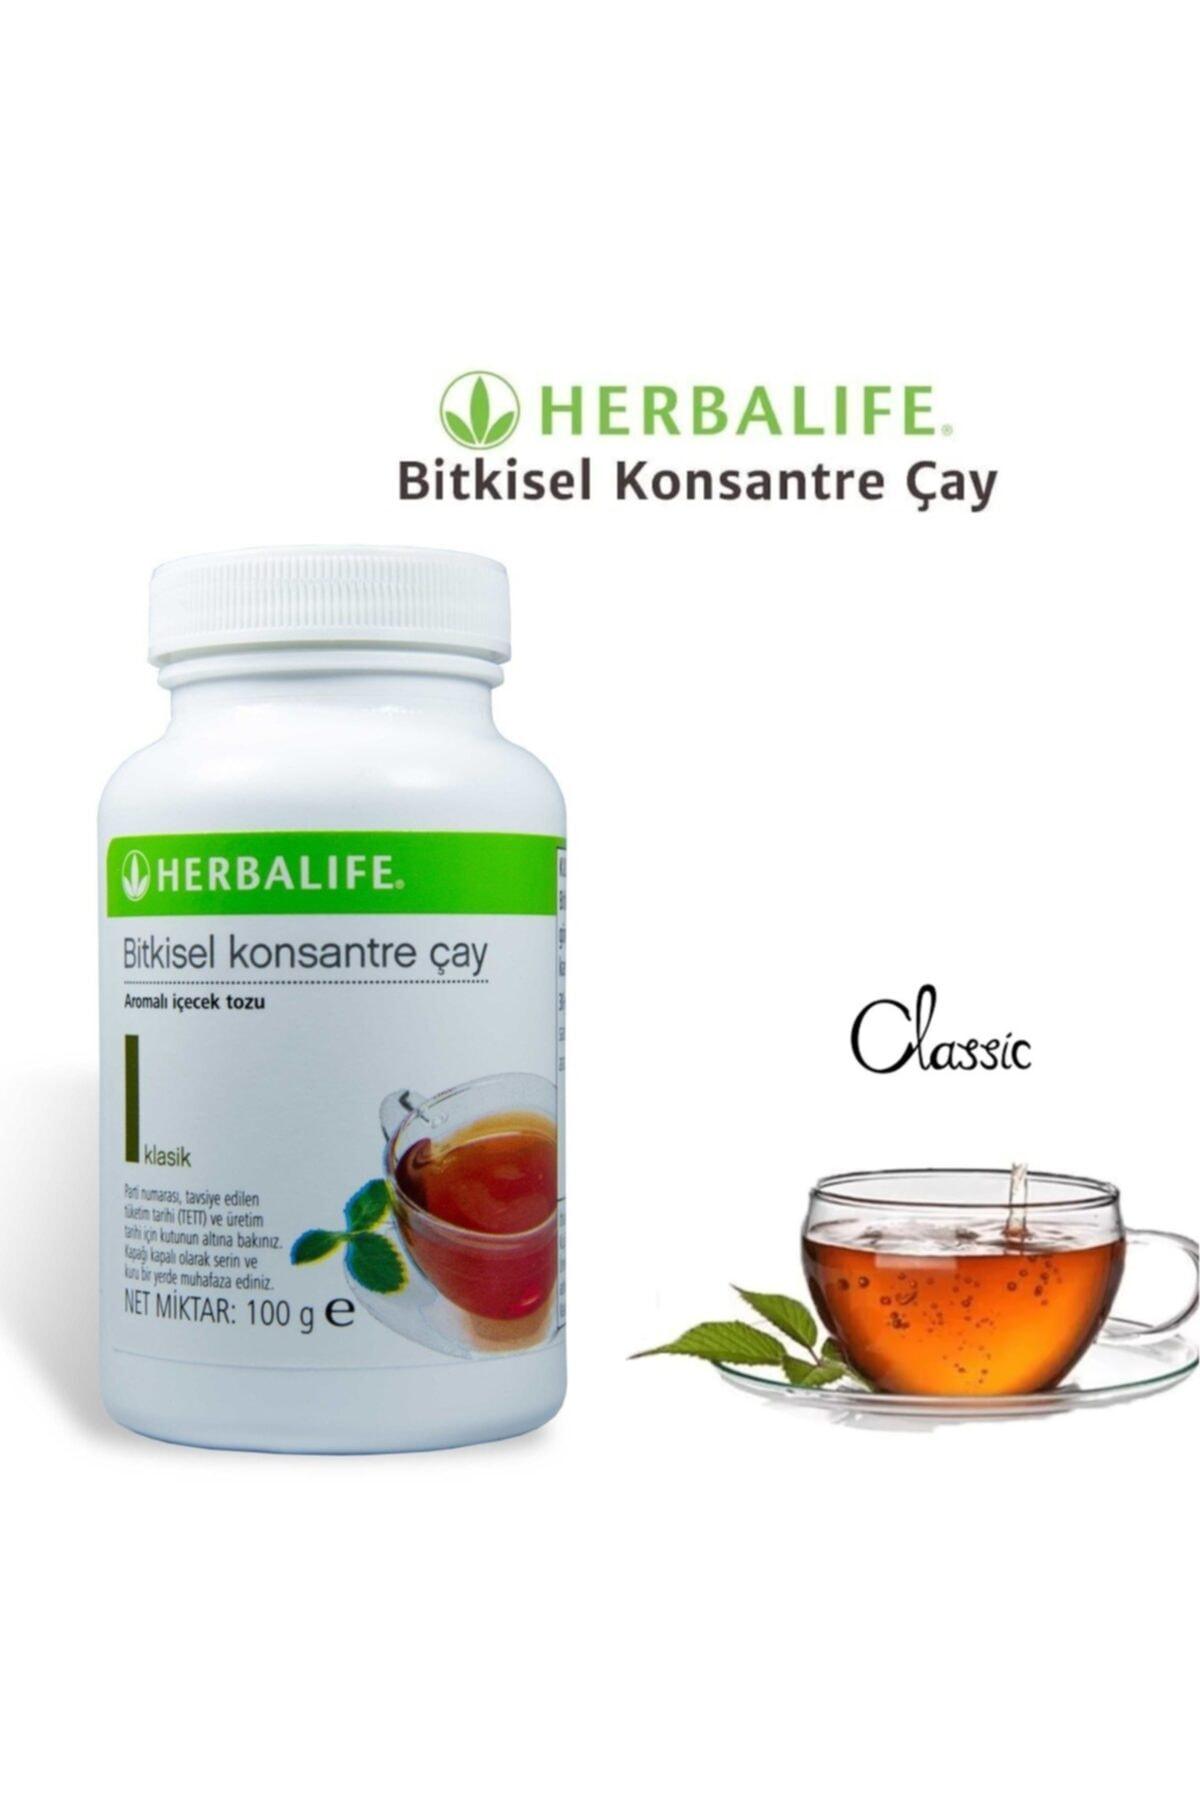 Herbalife 100gr Bitkisel Konsantre Aromalı Çay (Klasik) 2